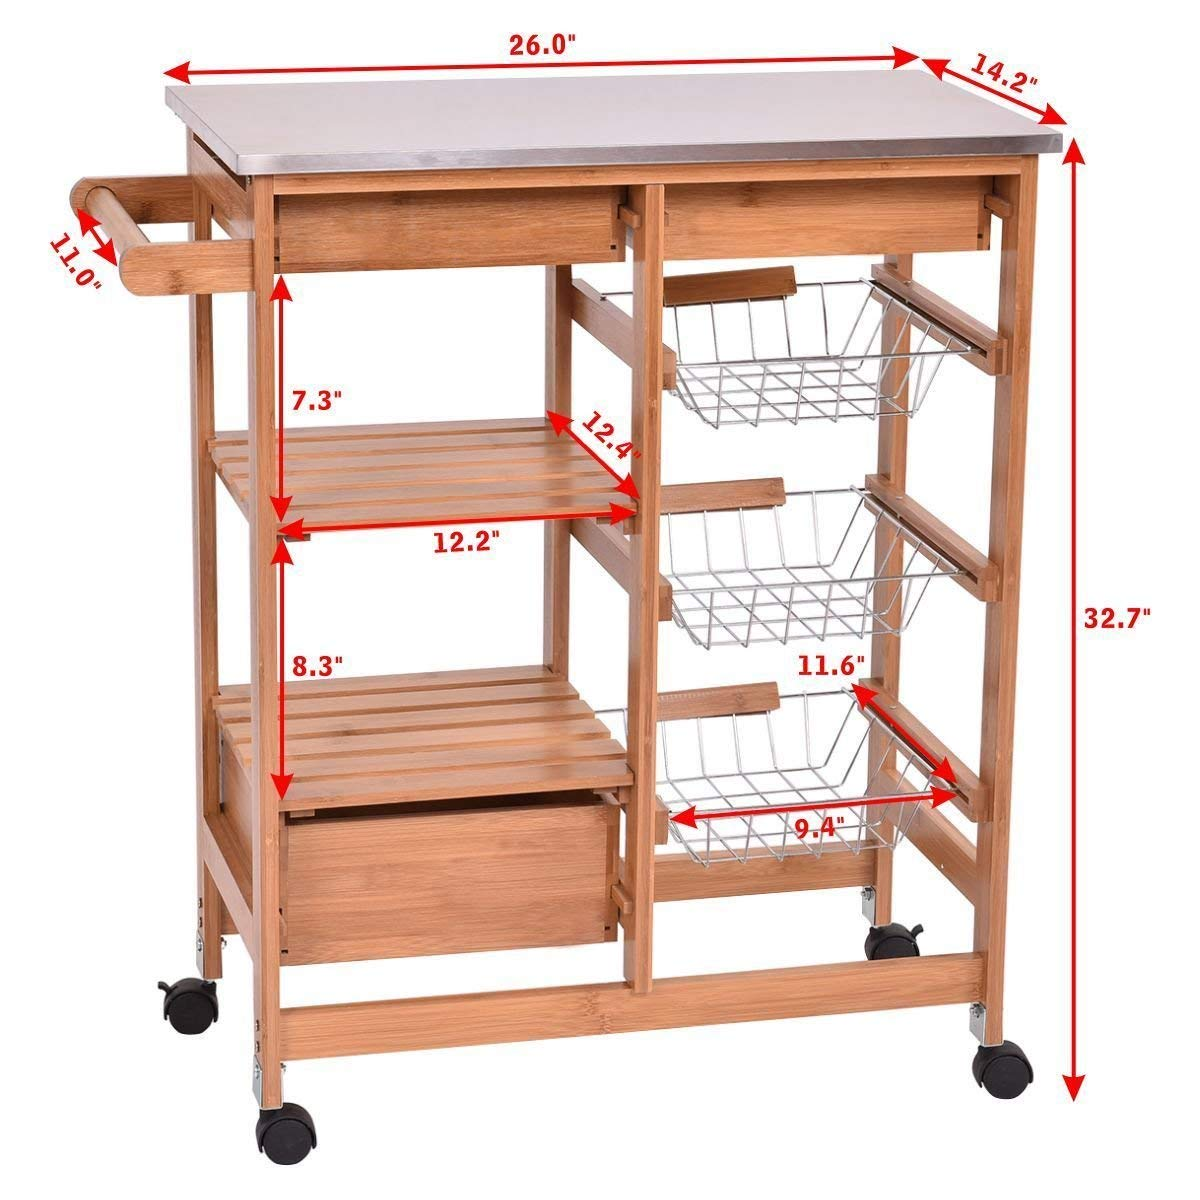 Bamboo portable Rolling Kitchen Island Trolley Cart Storage Shelf Drawers Basket Dining cart 5